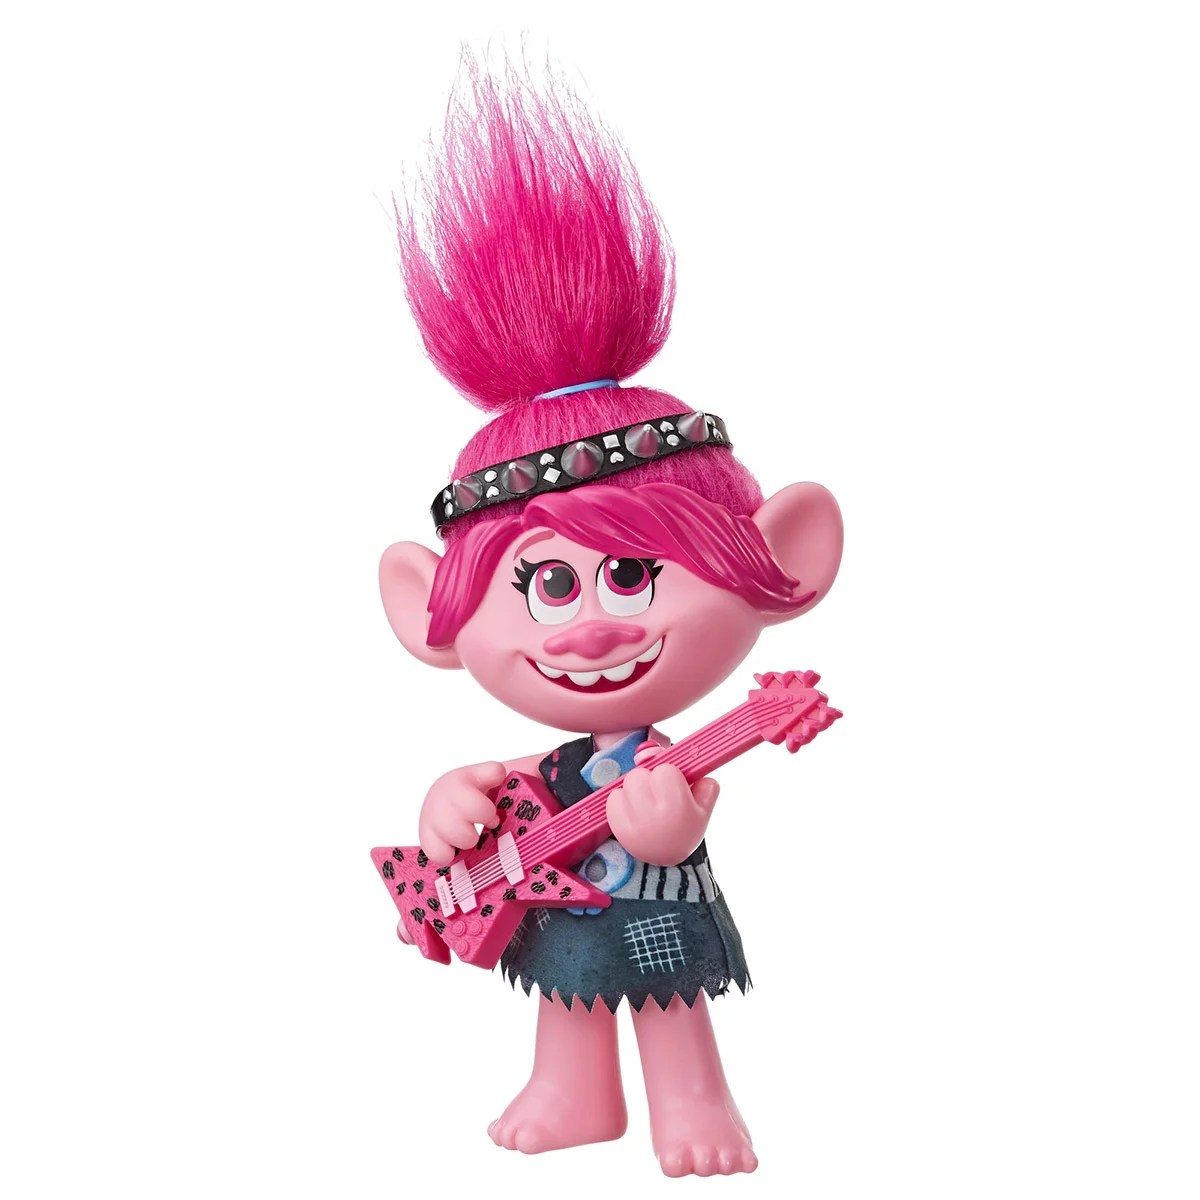 poupee poppy pop et rock les trolls 2 tournee mondiale